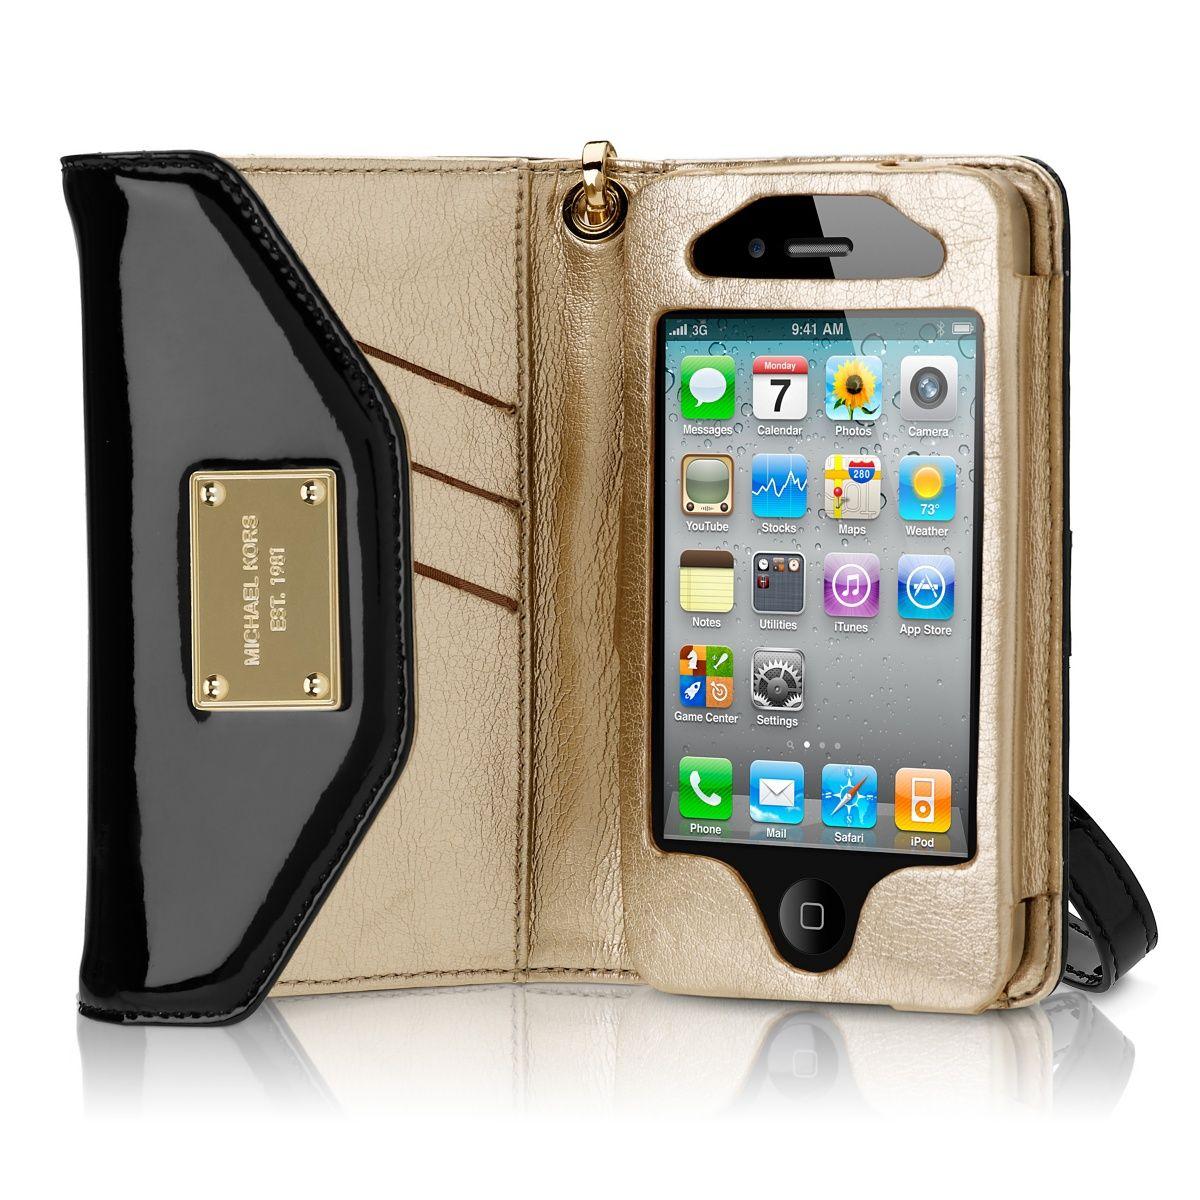 Michael Kors Wallet Clutch For Iphone Apple Store U S Clutch Wallet Michael Kors Wallet Iphone Wristlet